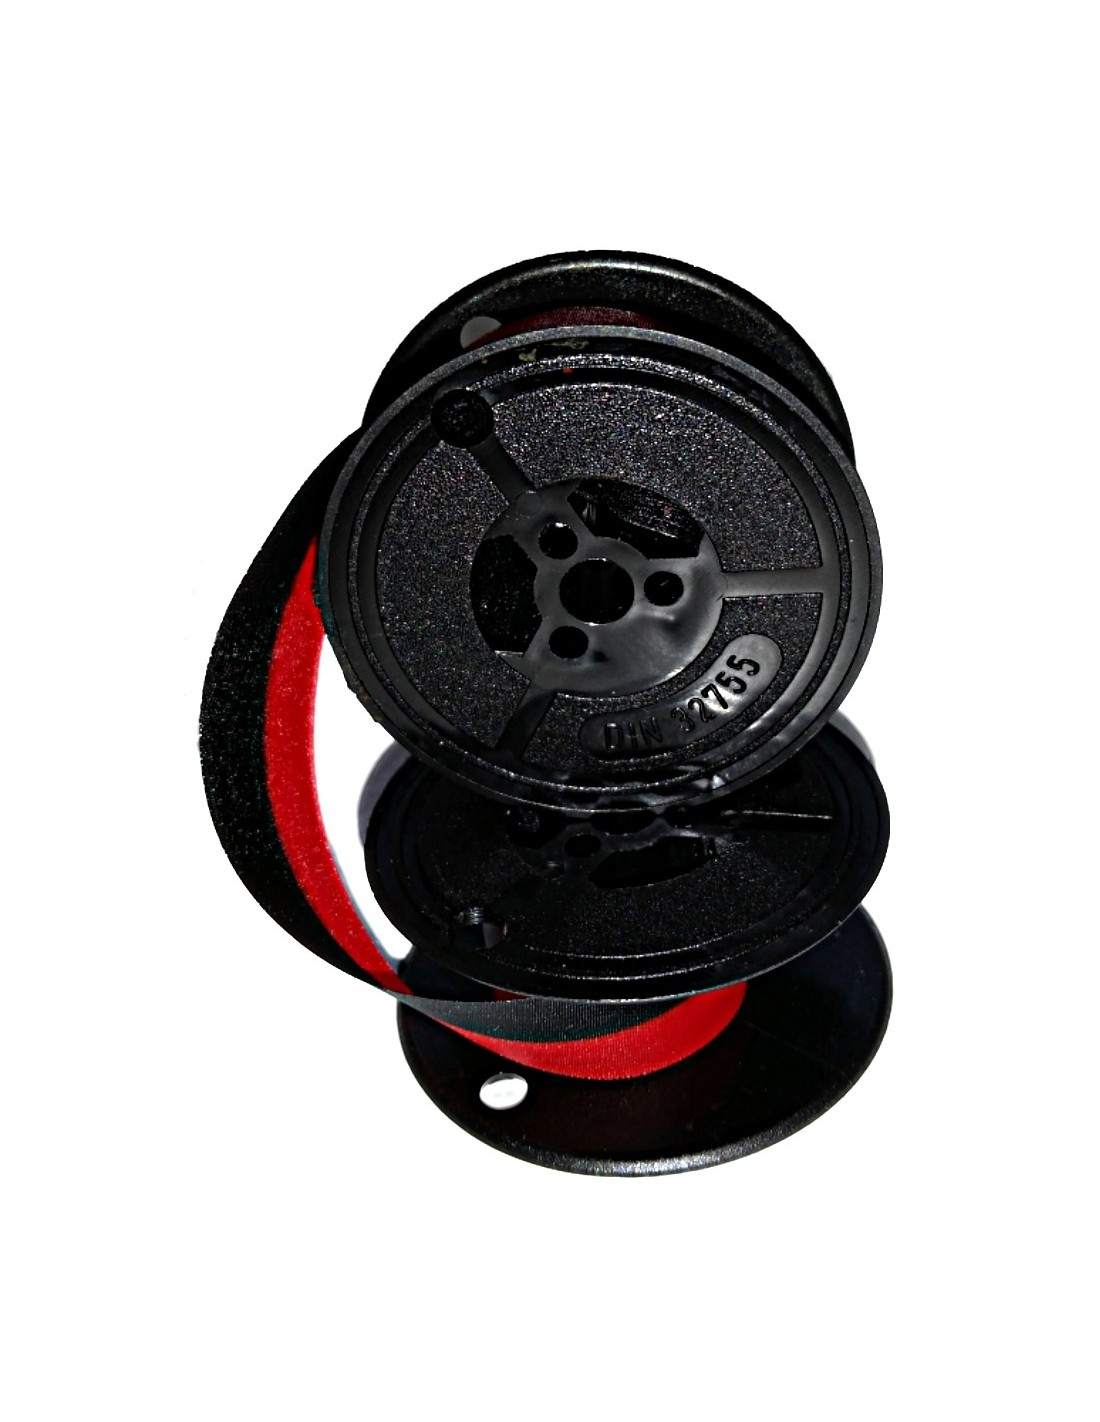 farbband doppelspule f r olympia am 120 40mm durchmesser schwarz rot. Black Bedroom Furniture Sets. Home Design Ideas